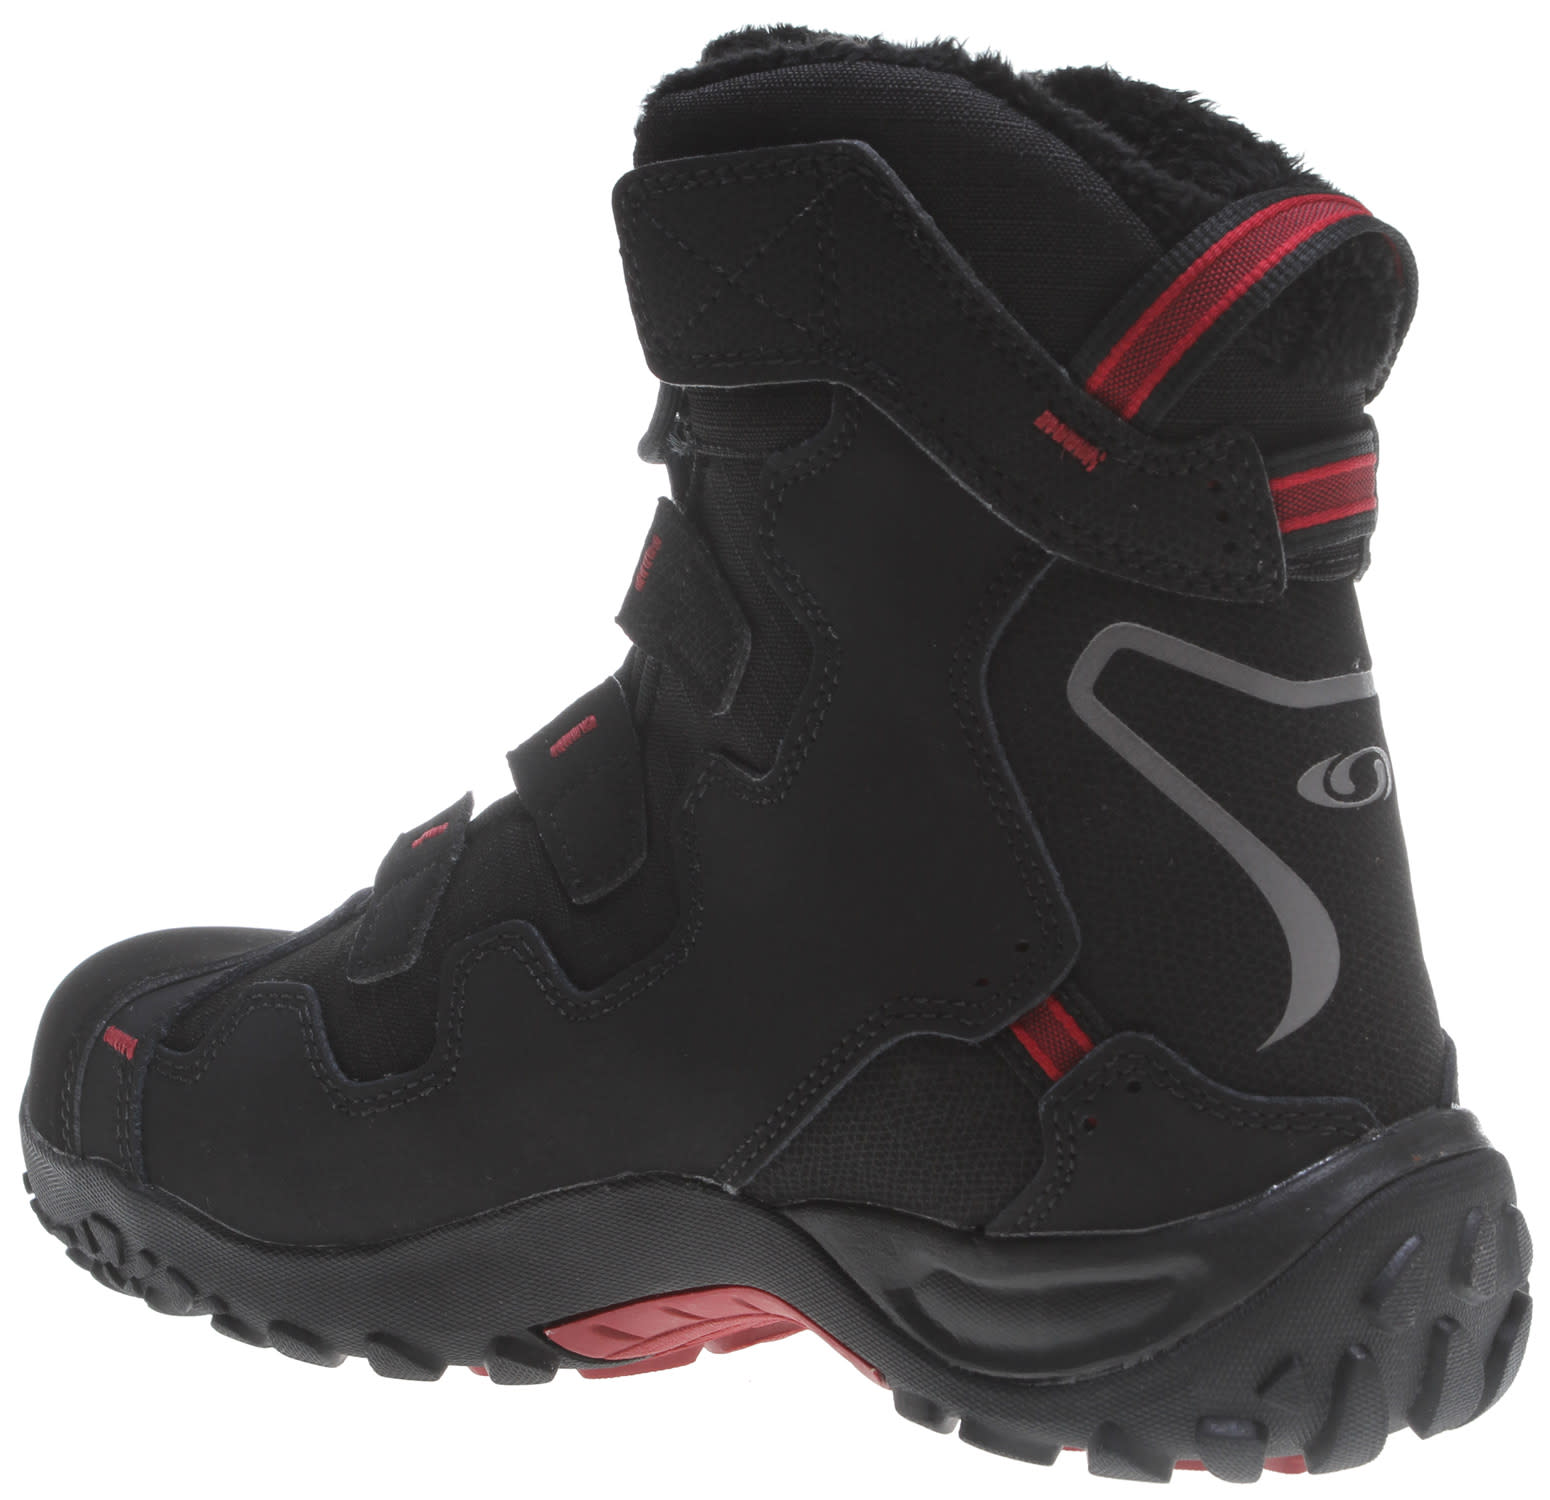 Salomon Snowtrip TS WP Boots Womens